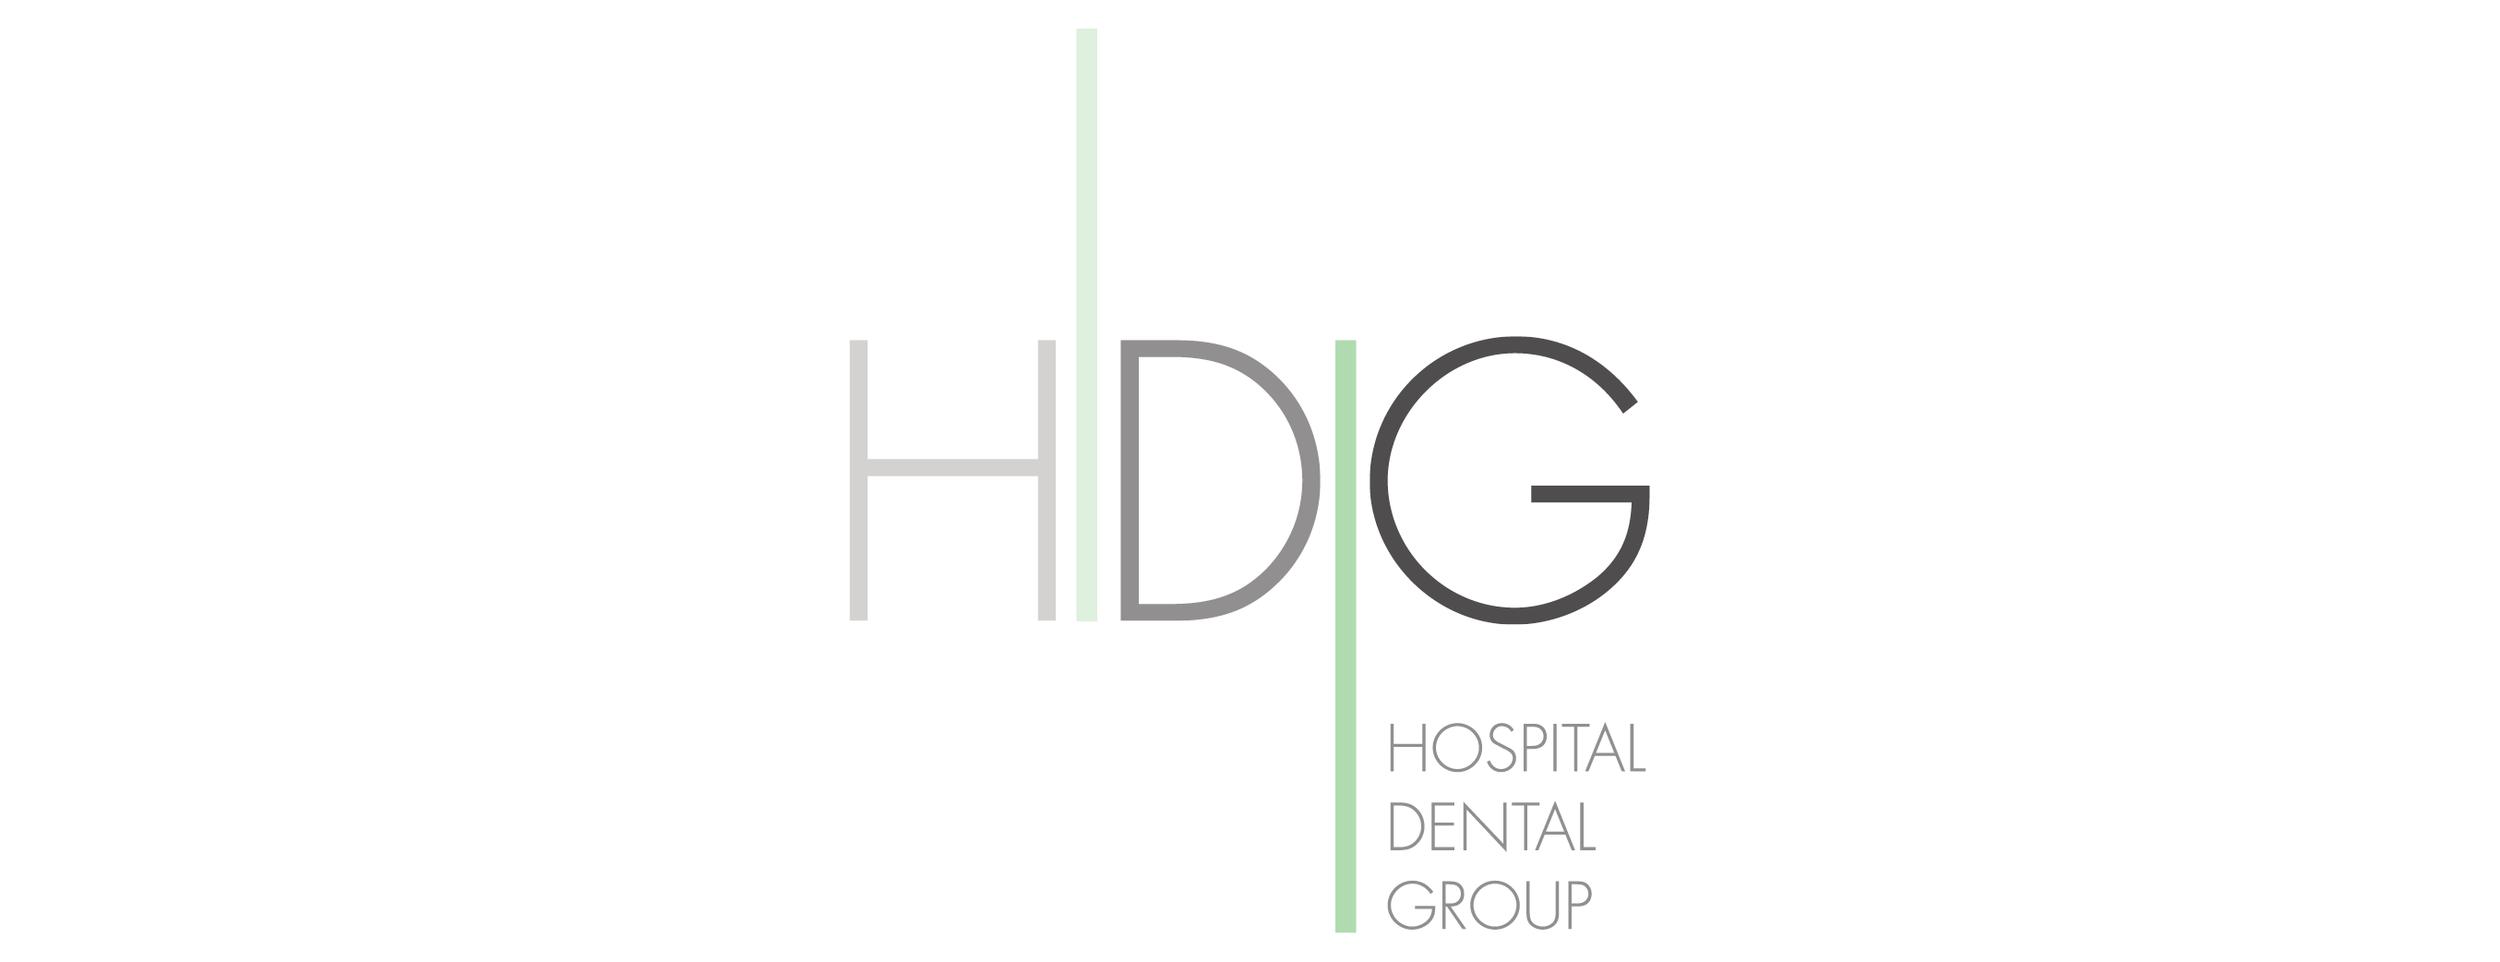 Hospital Dental Group